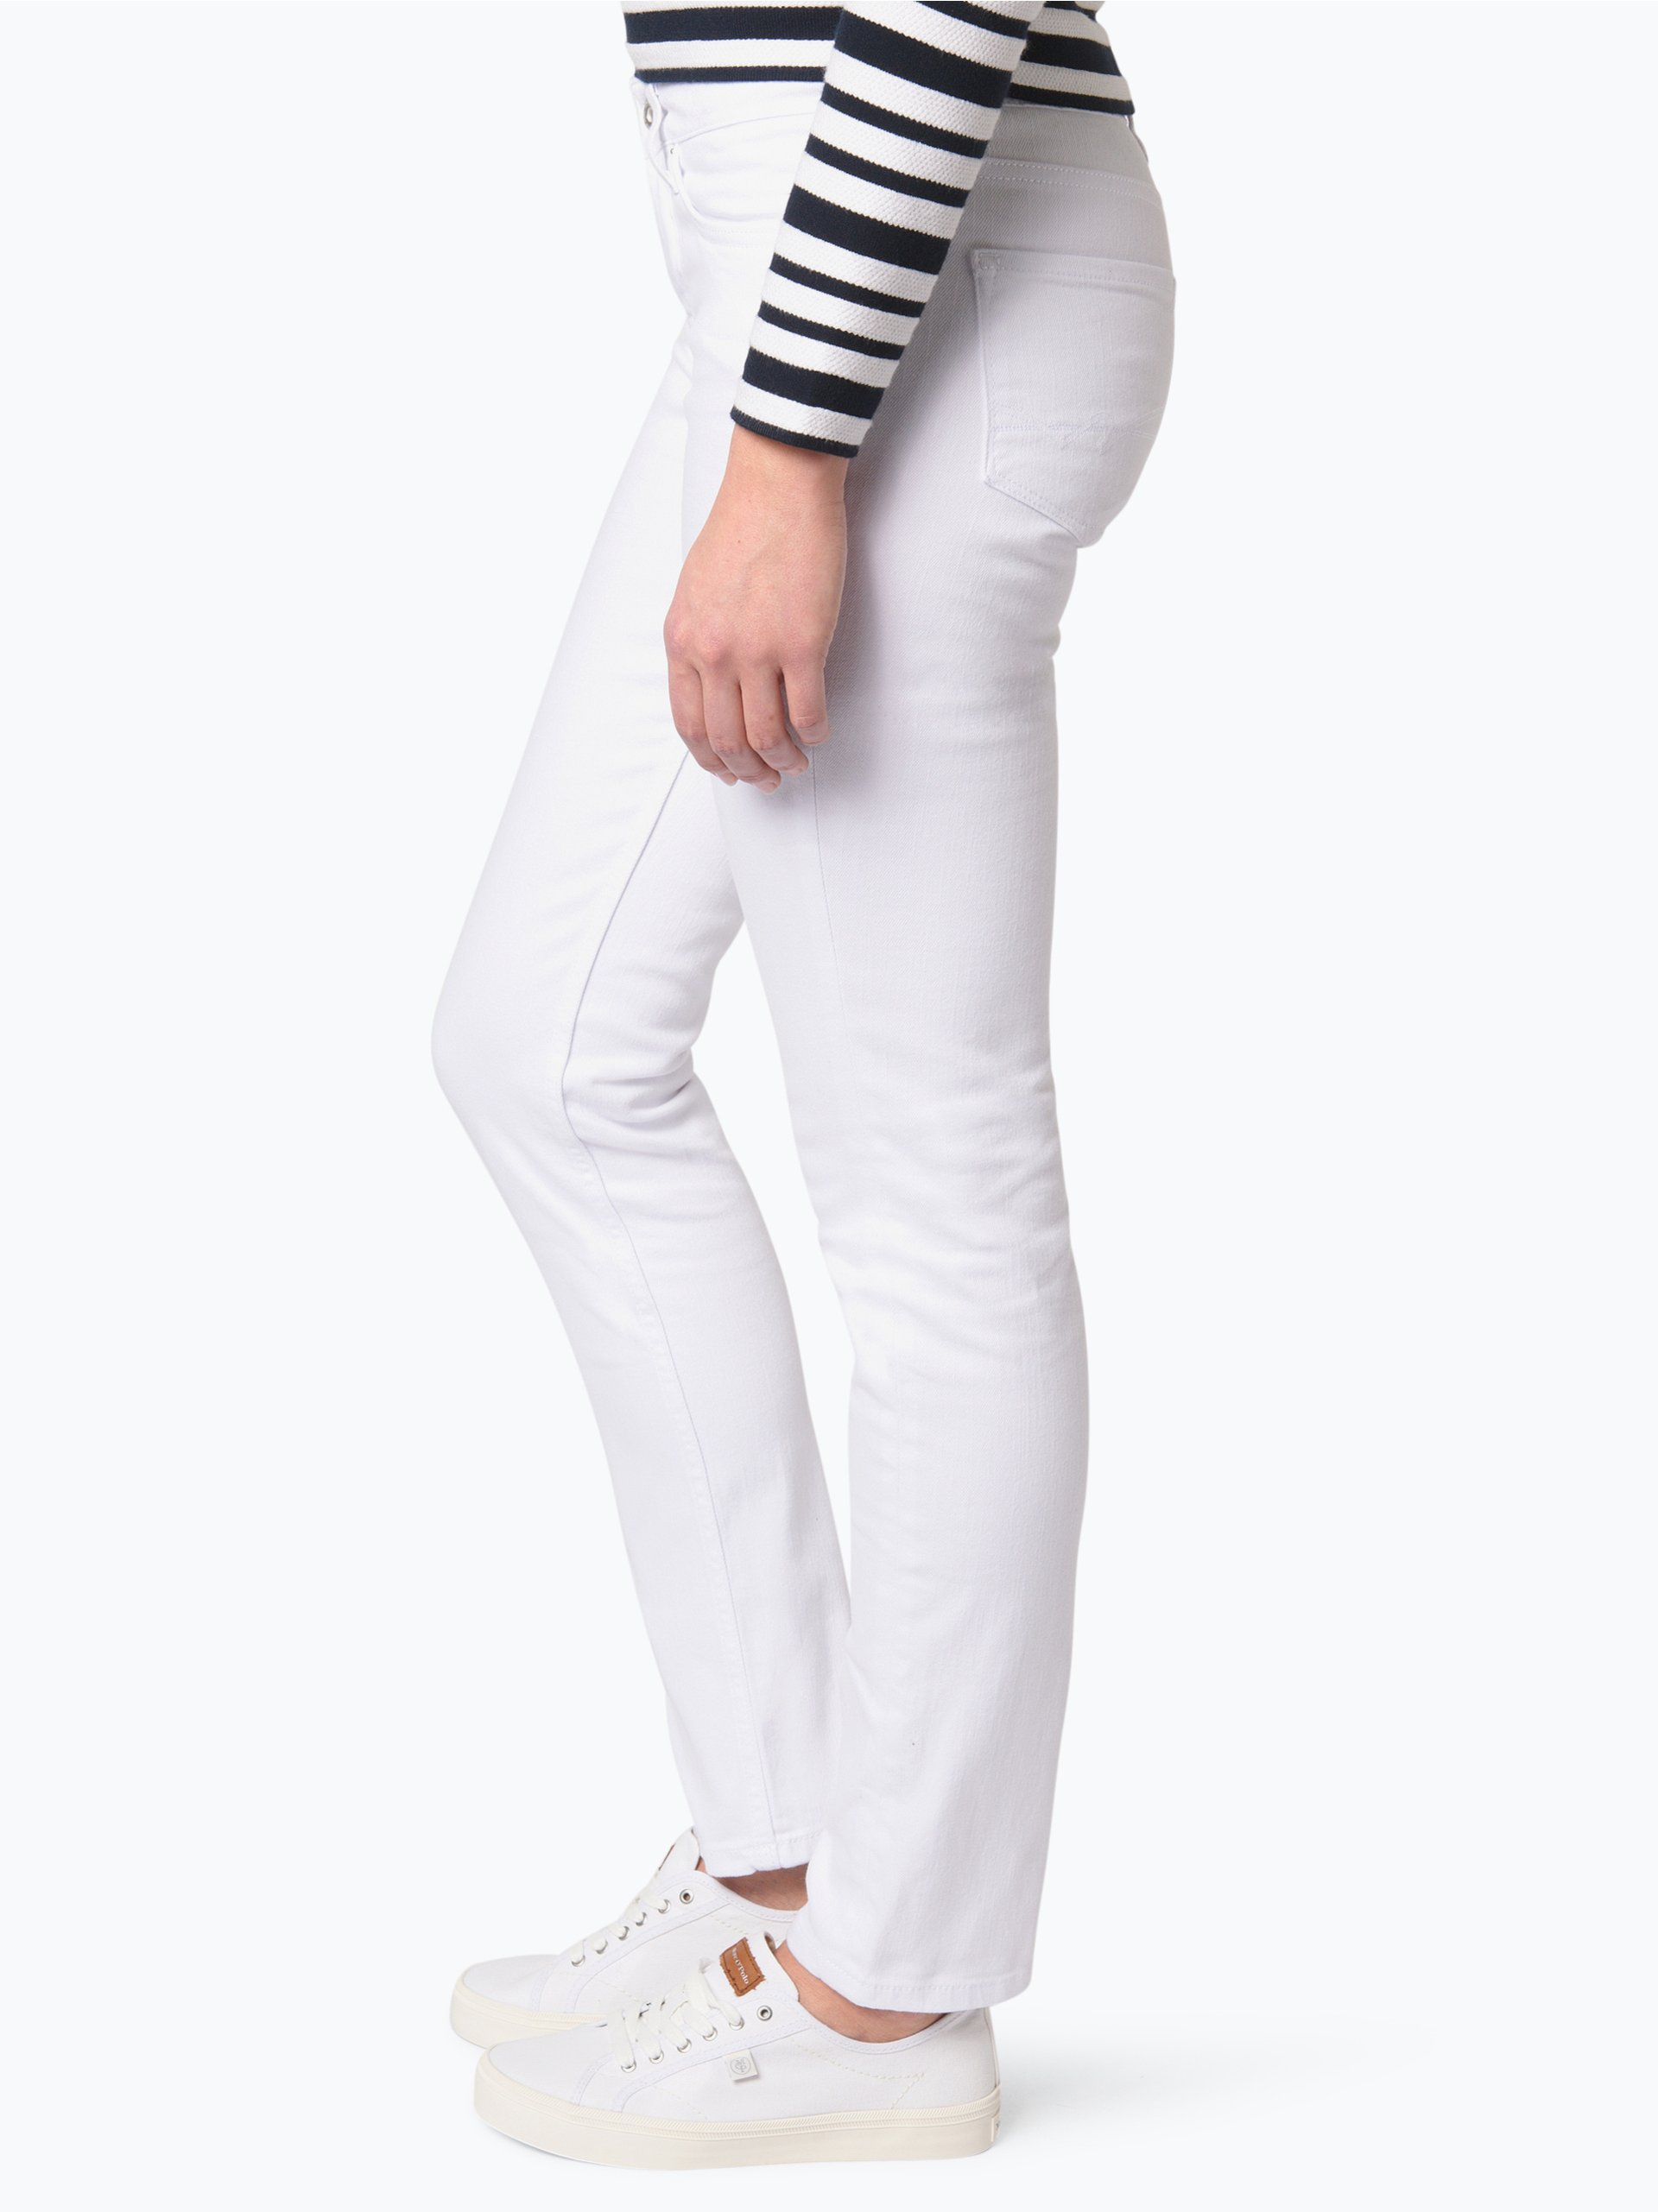 tommy hilfiger damen jeans rome rw online kaufen peek. Black Bedroom Furniture Sets. Home Design Ideas